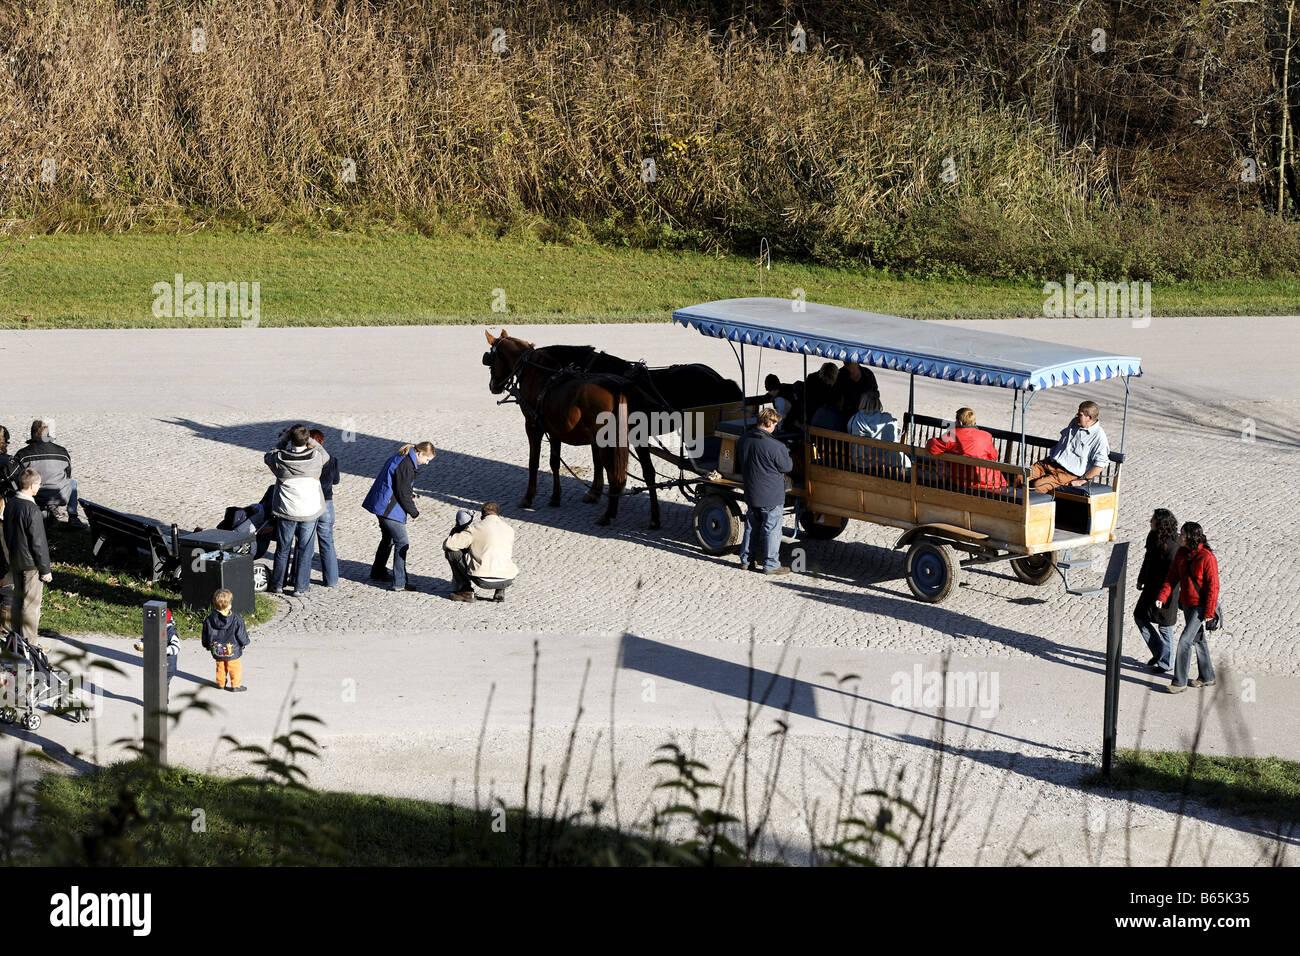 Horse drawn carriage on Herreninsel island, Chiemsee, Chiemgau, Upper Bavaria, Bavaria, Germany, Europe - Stock Image